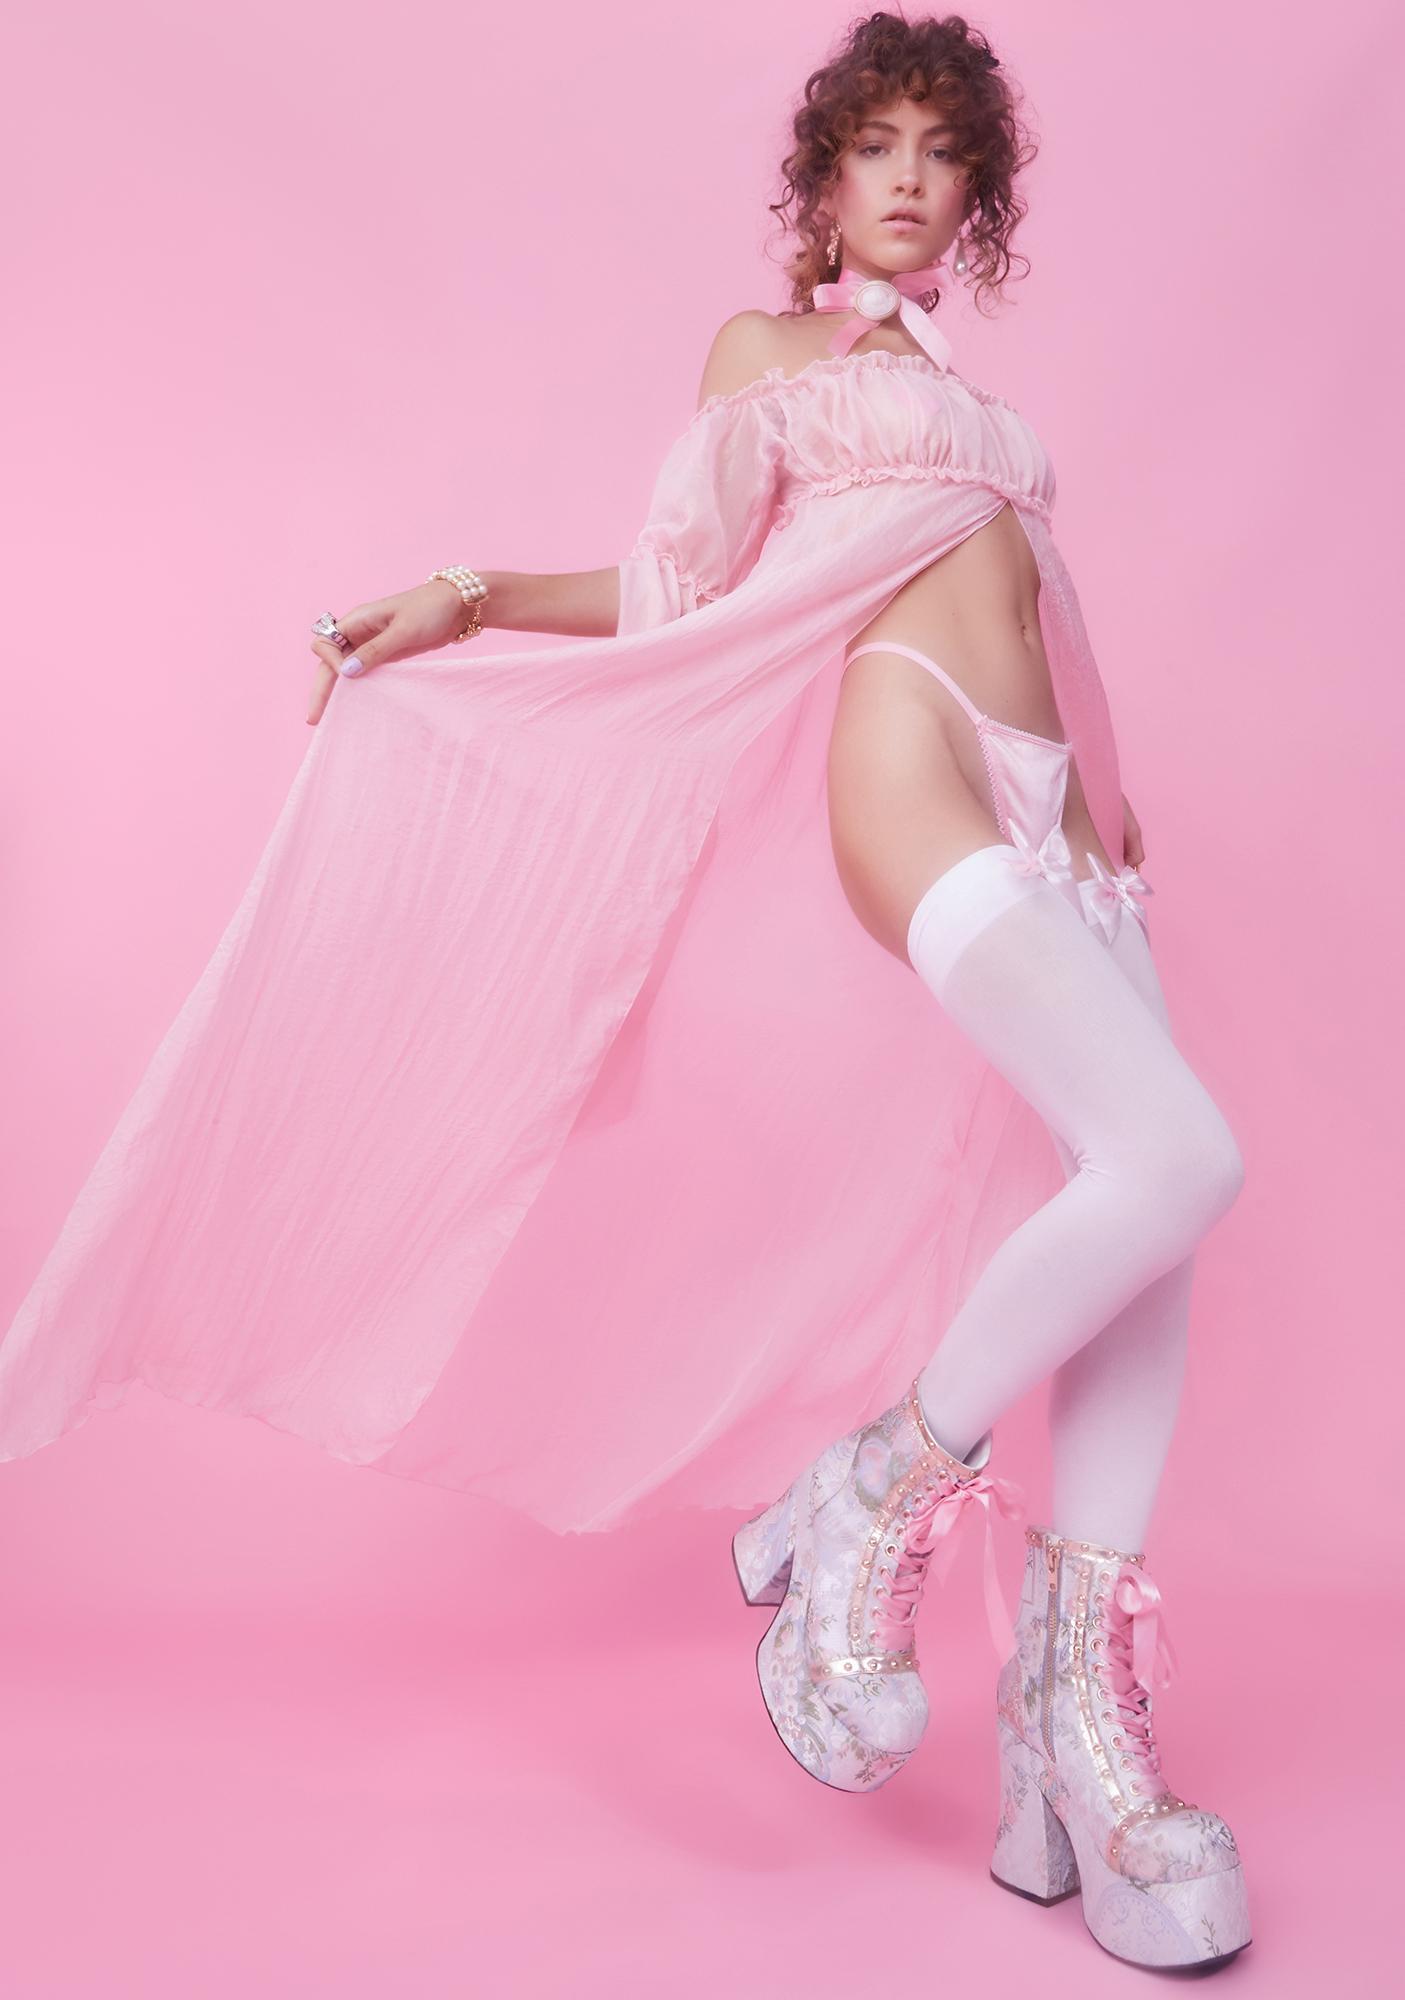 Sugar Thrillz Heiress Attitude Chiffon Maxi Dress And Panty Set